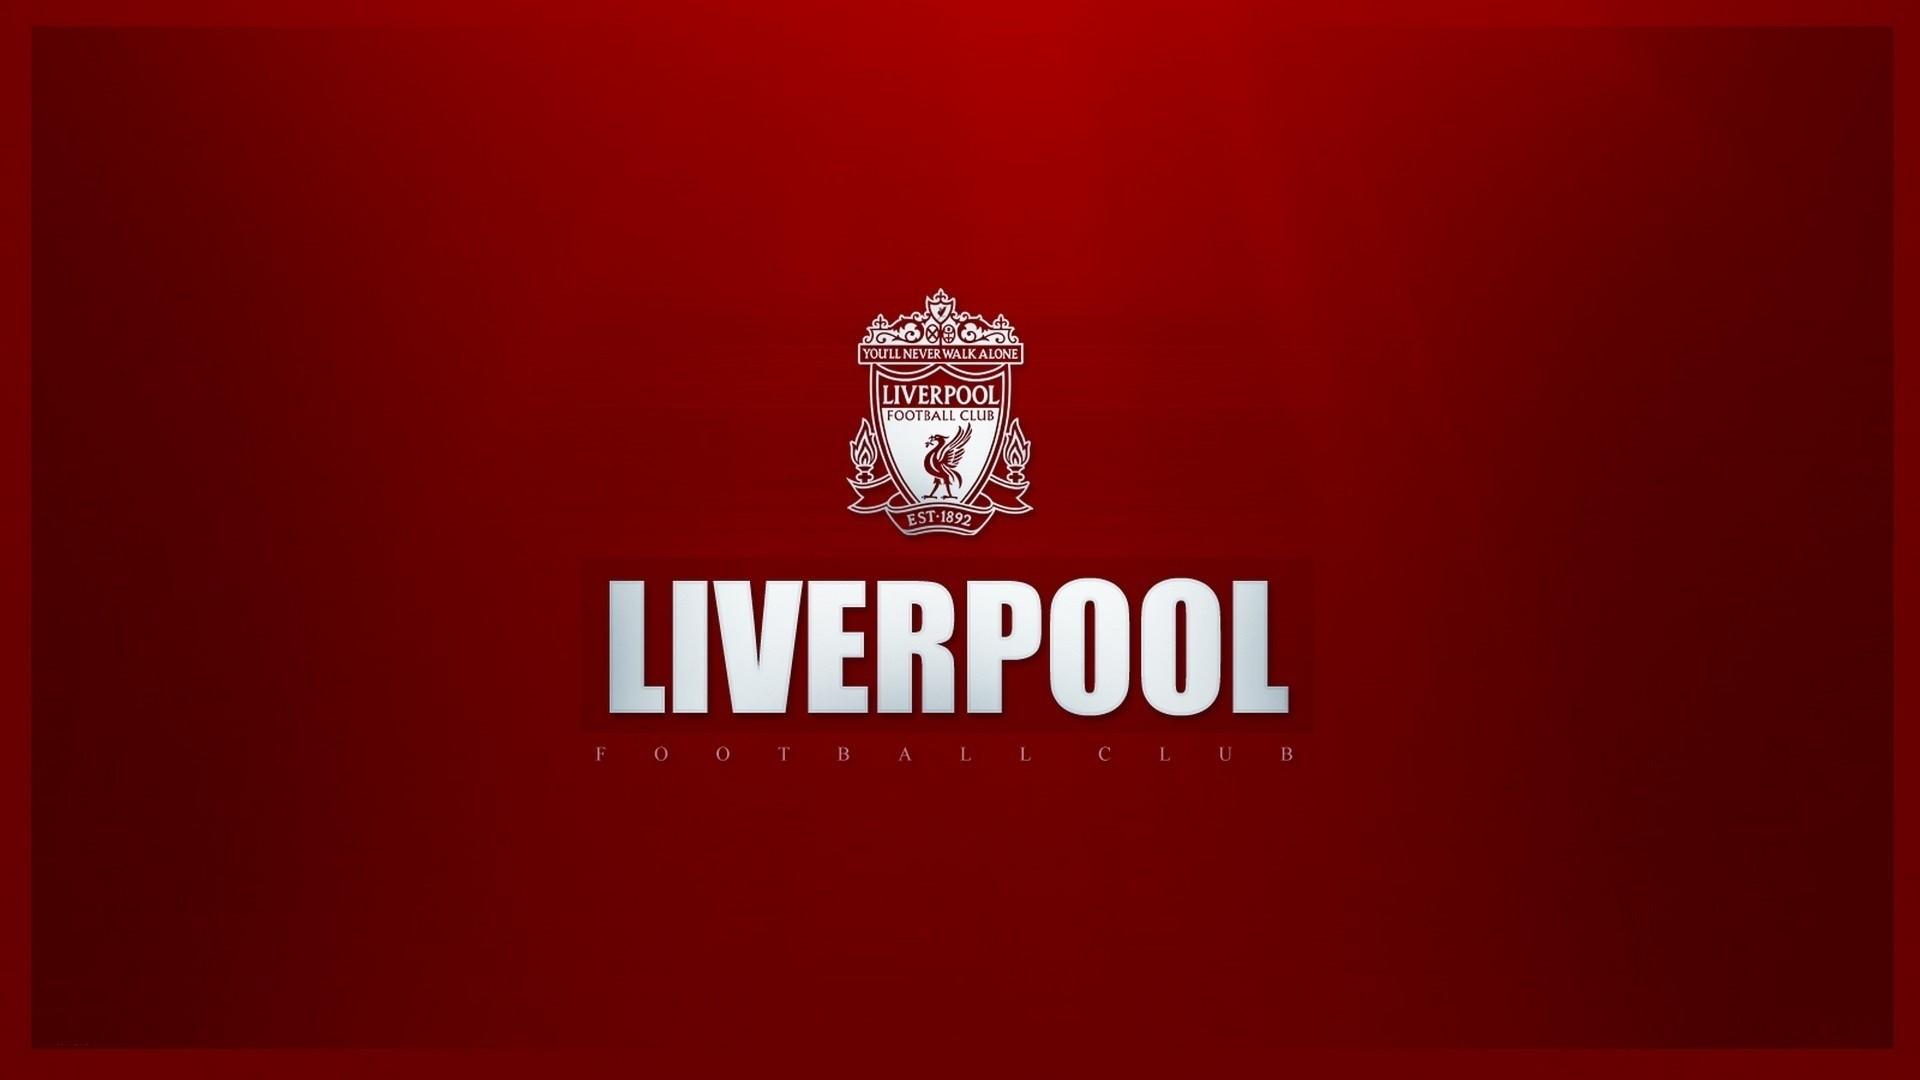 Liverpool Wallpaper theme